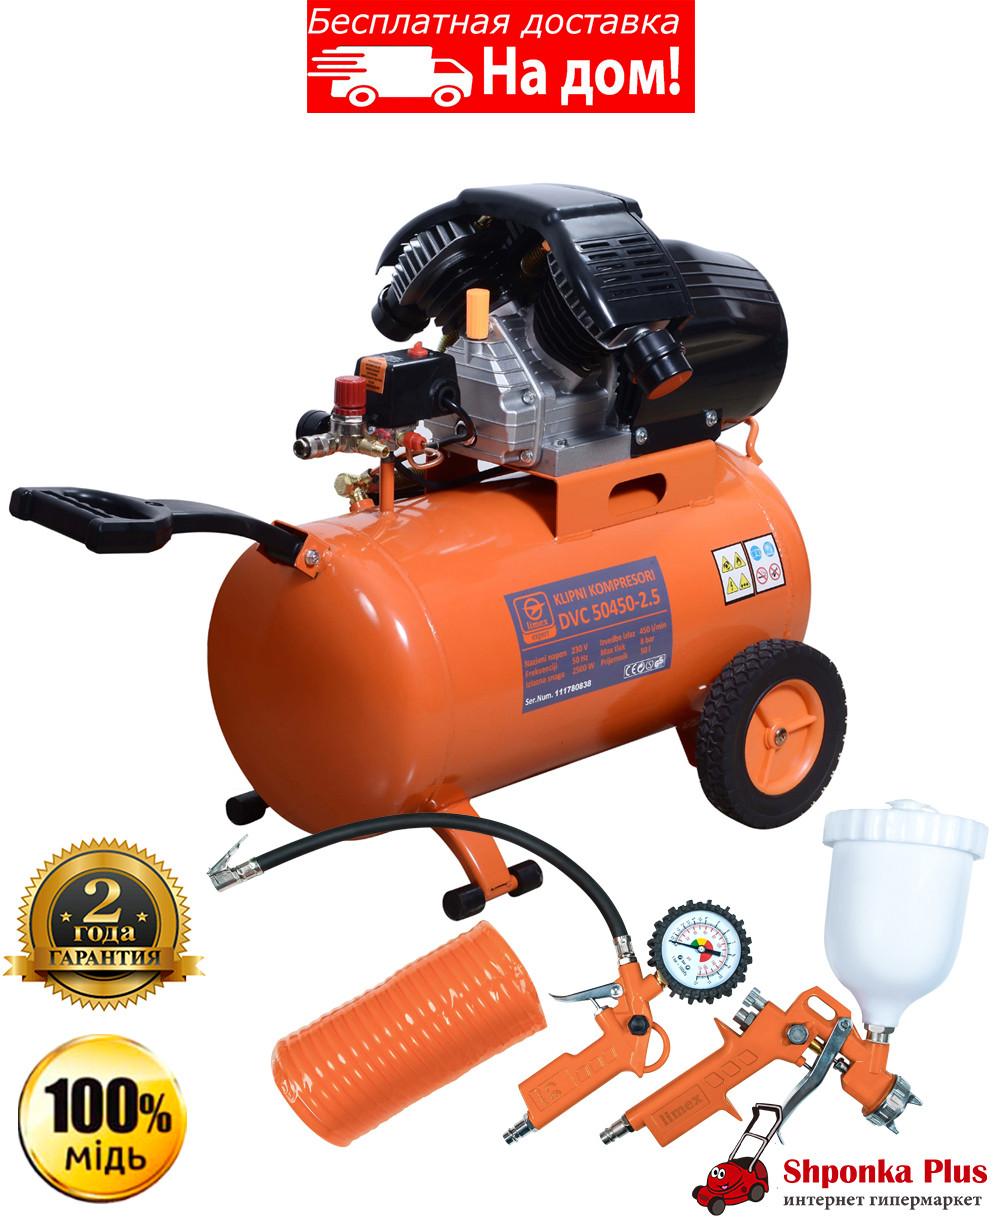 Компрессор 50 л, 2,5 кВт, 450 л/мин., Limex expert DVC-50450-2.5 KIT